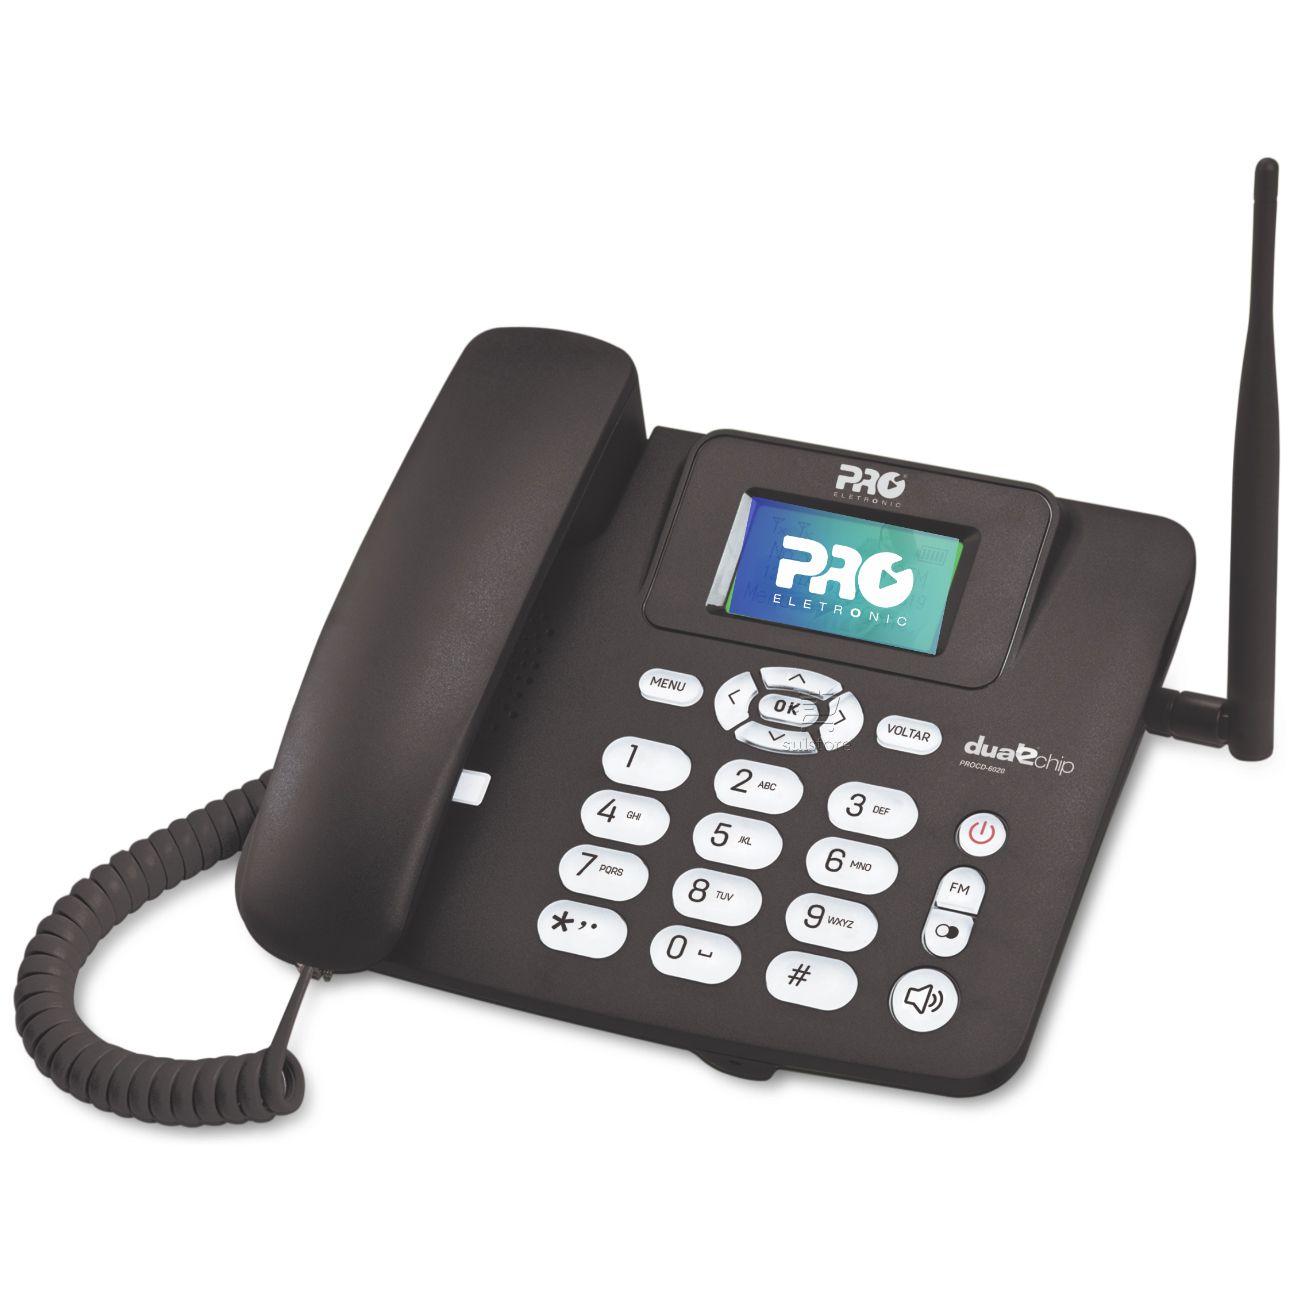 Telefone Celular Fixo Rural Pro Eletronic PROCD-6020 Dual Chip Desbloqueado